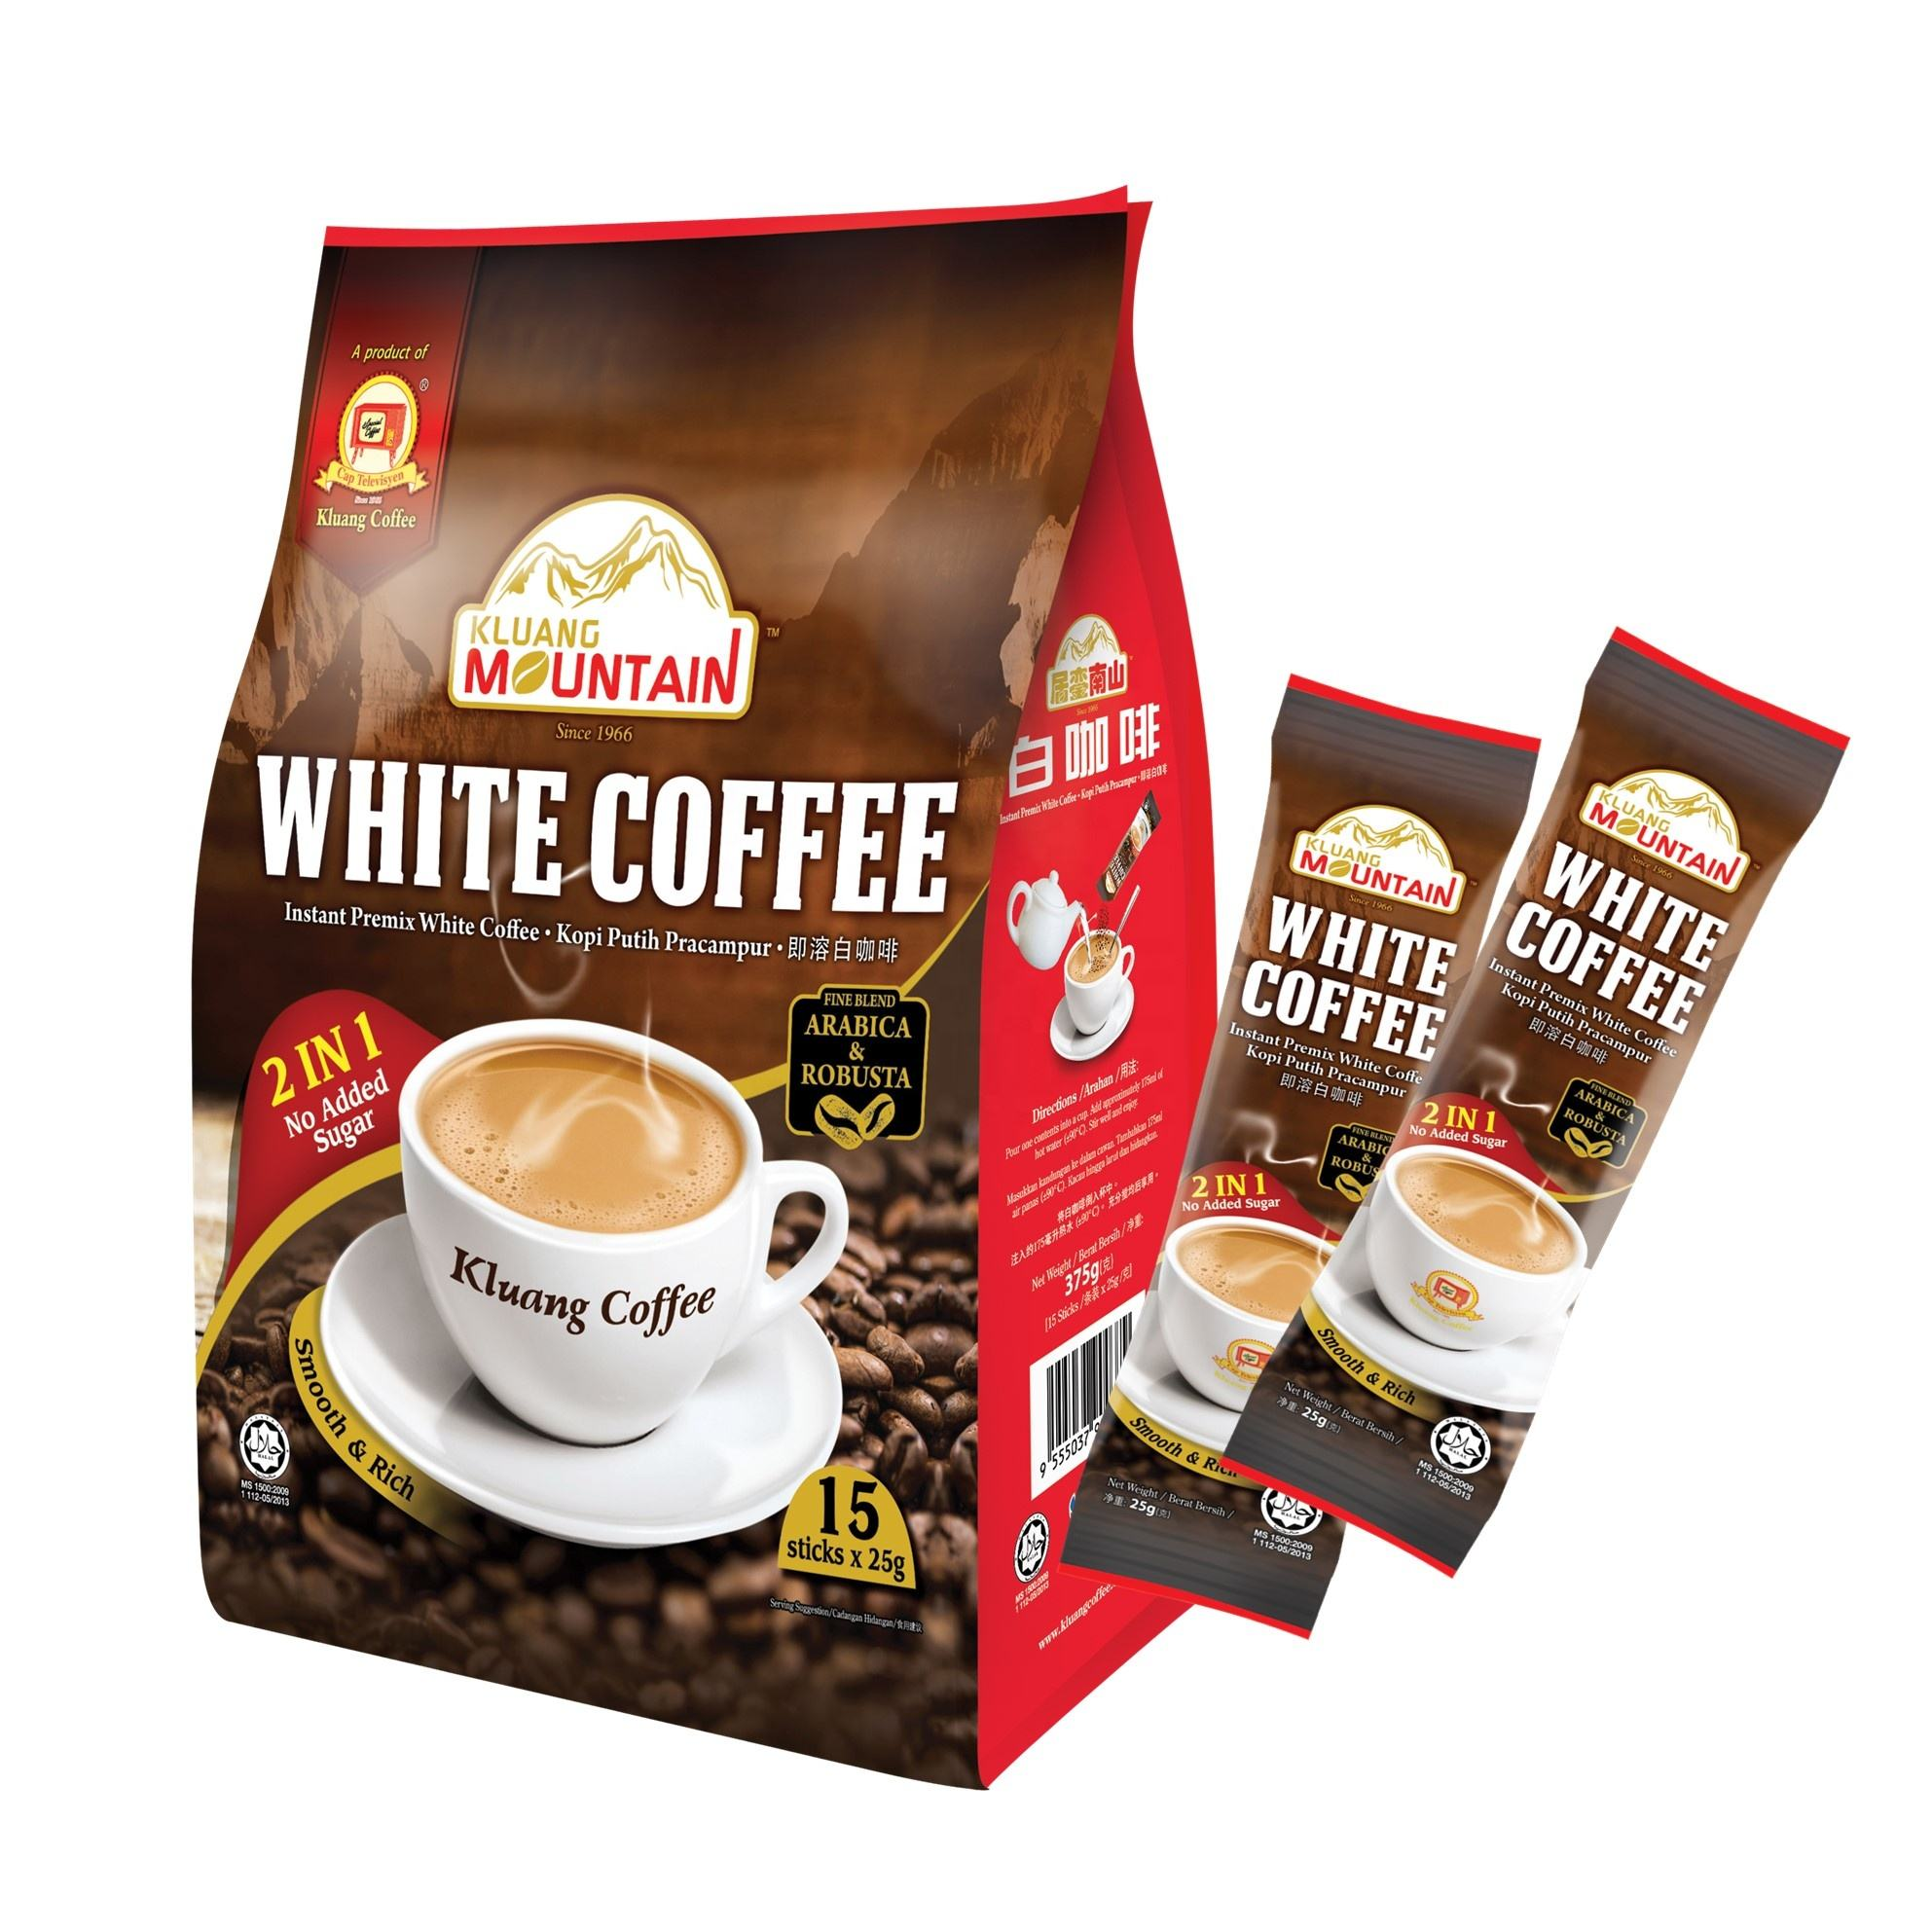 Kluang Mountain Instant White Coffee 2 in 1 (No Added Sugar) Malaysia HALAL (15 Sticks x 25g) Televisyen Brand Net Weight 375g